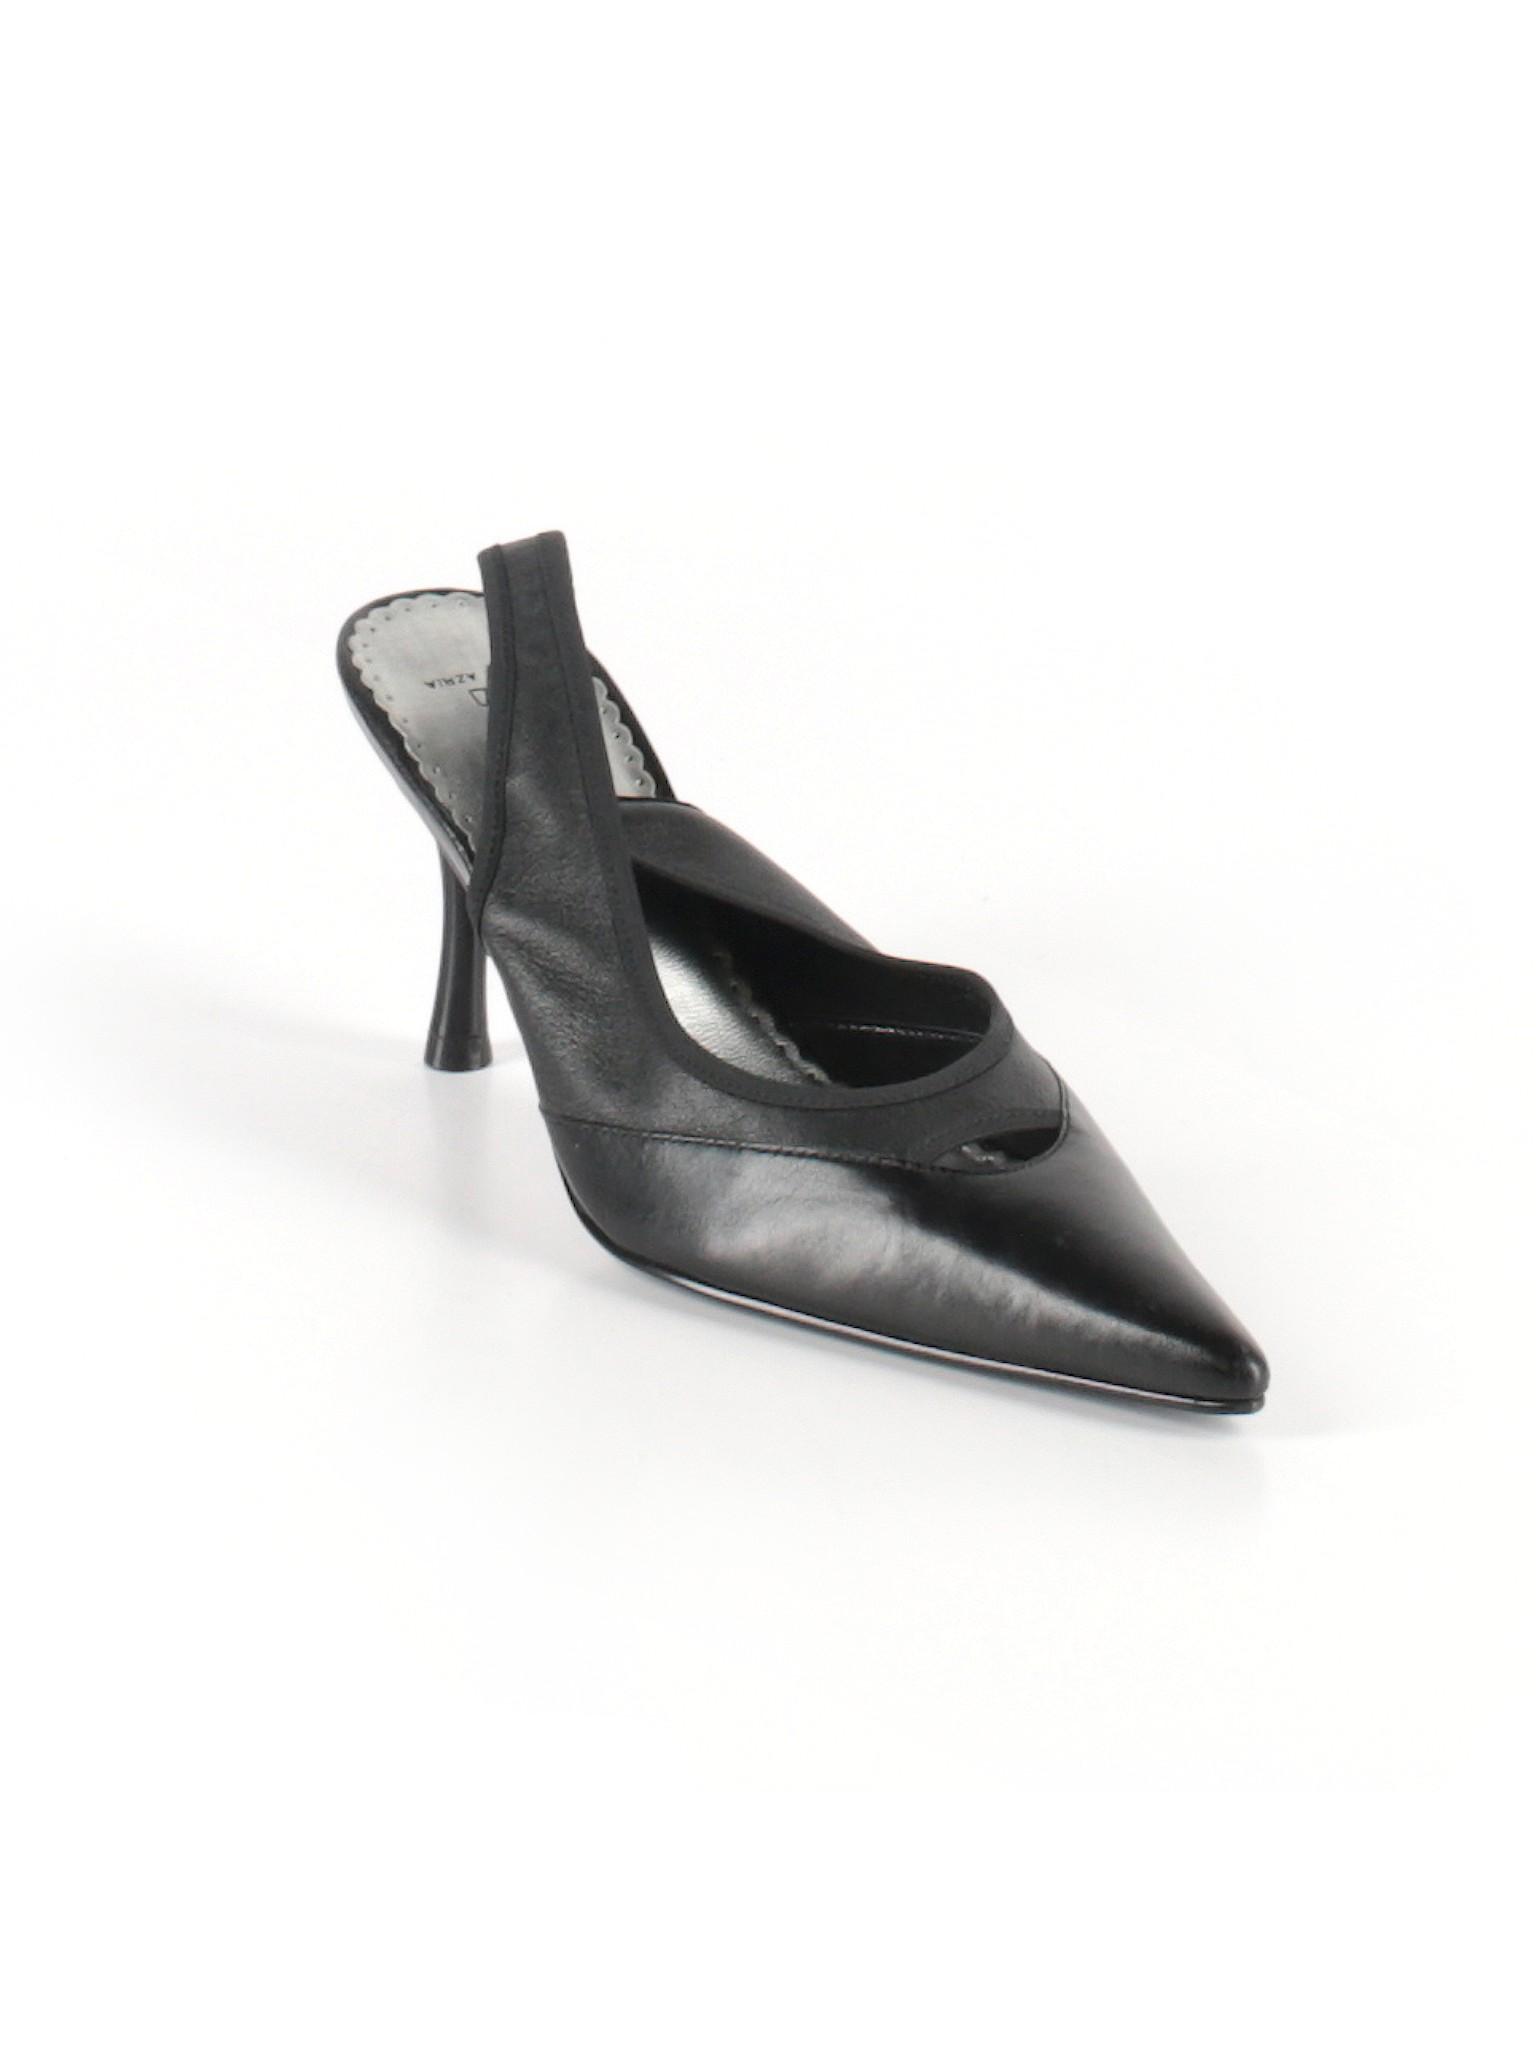 Boutique Heels BCBGirls Boutique Boutique Heels promotion promotion promotion BCBGirls C5x0wq0t